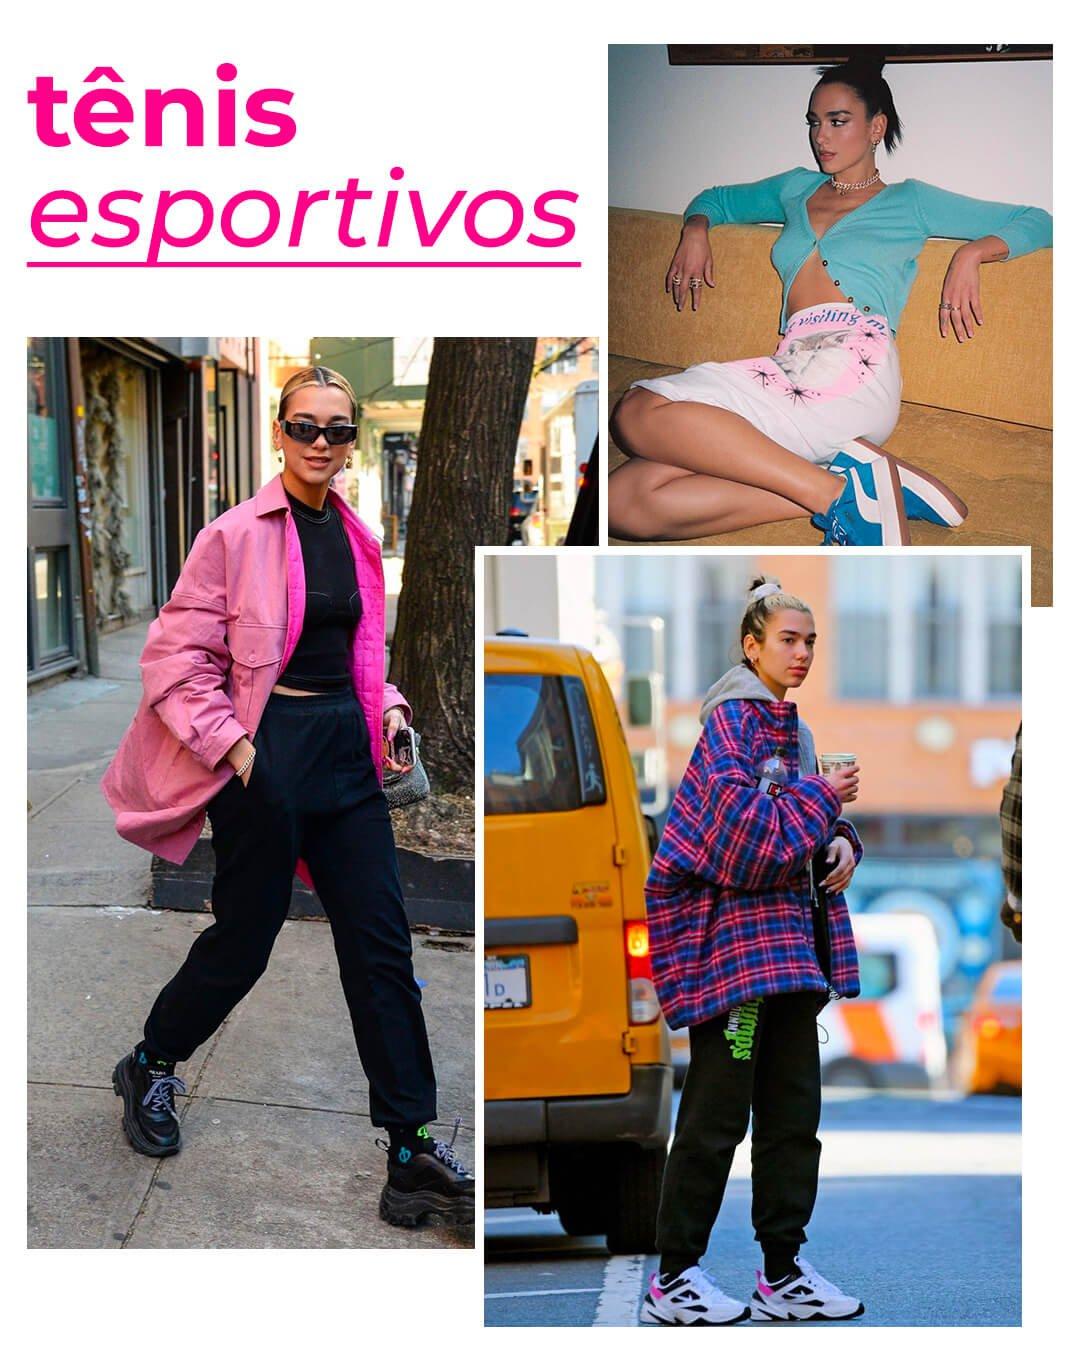 It girls - Tênis esportivo - Dua Lipa - Outono - Street Style - https://stealthelook.com.br